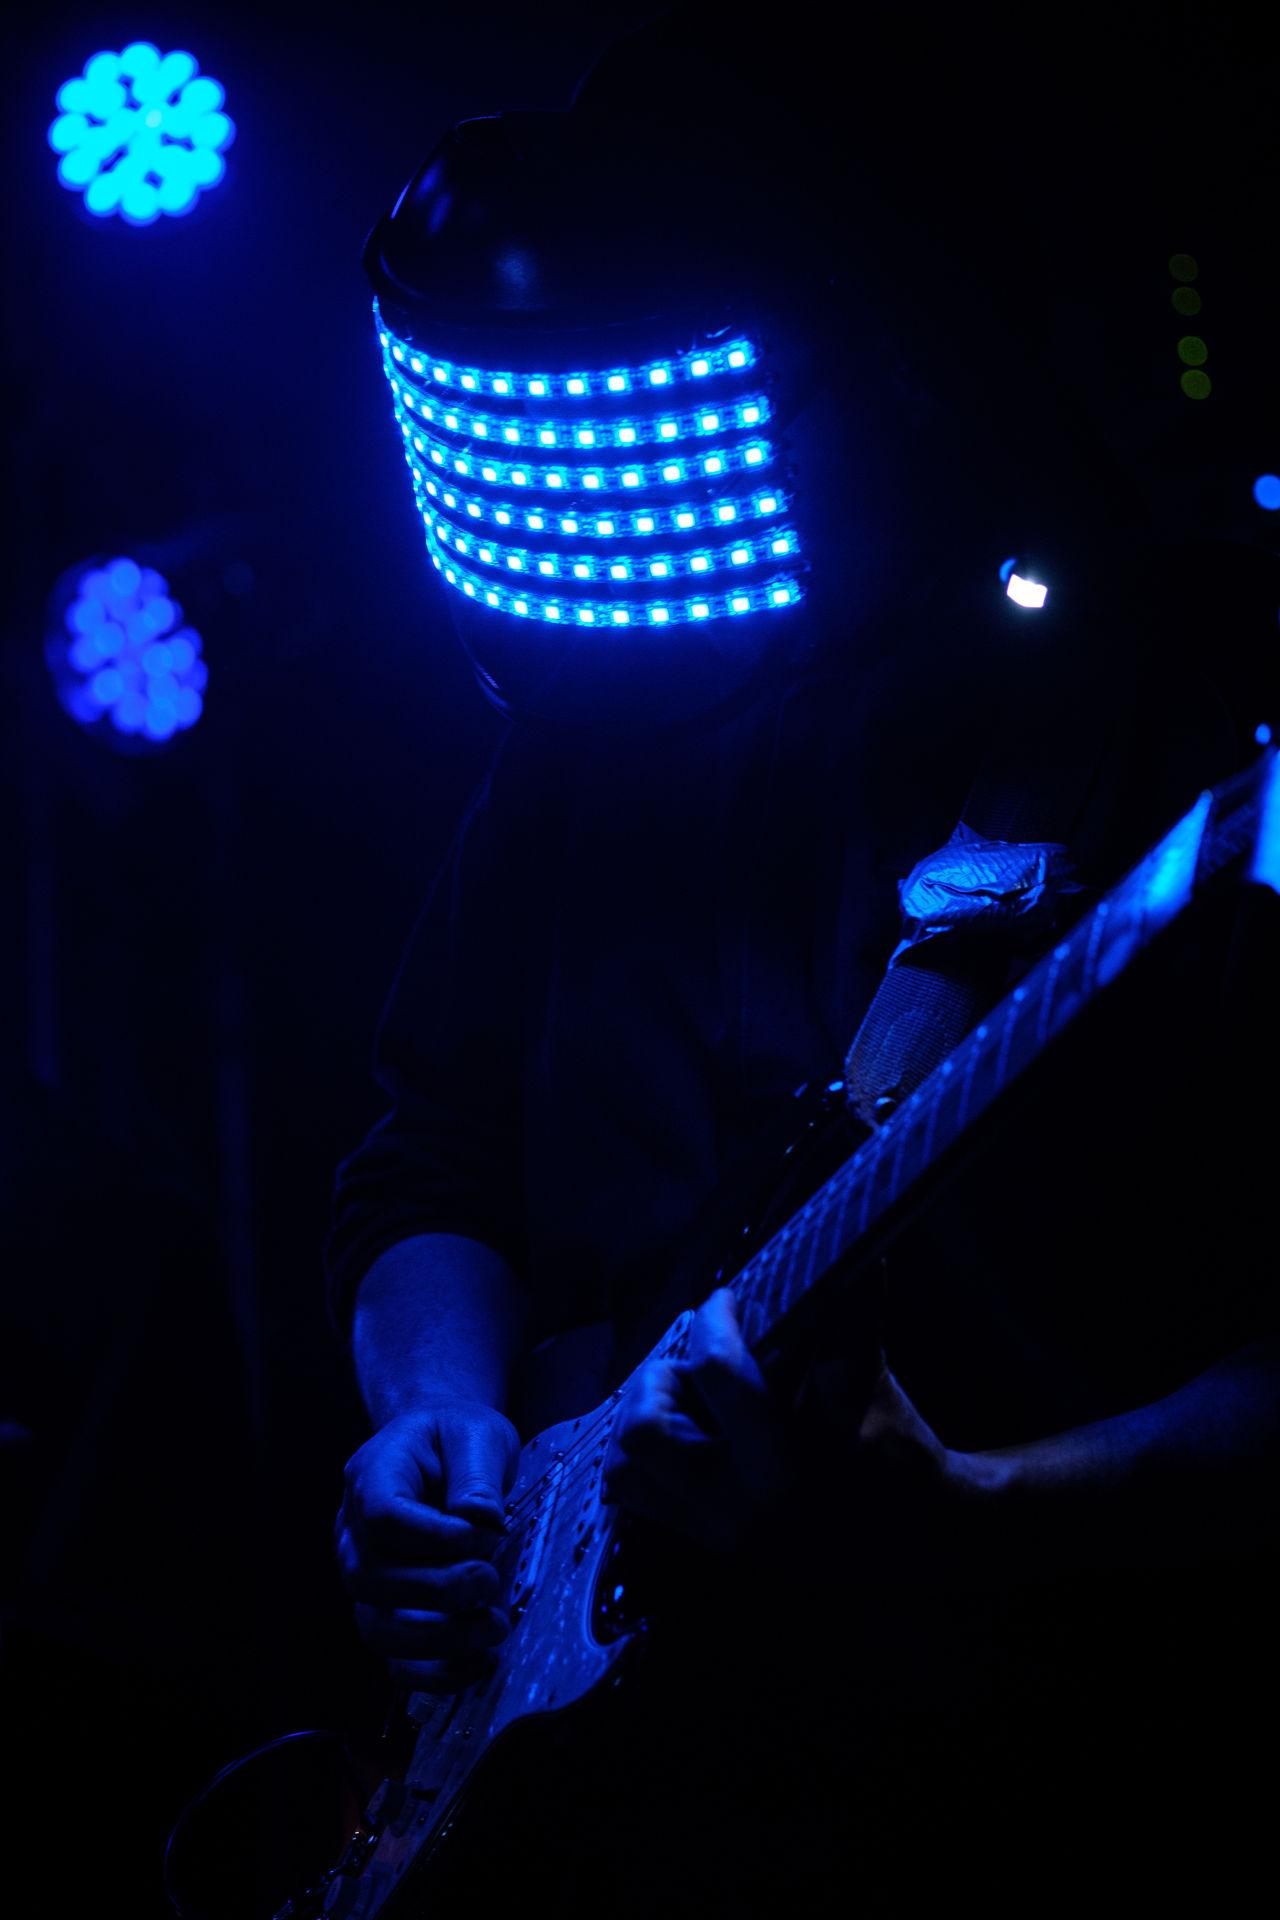 Berlin Led Helmets Lido Lido Berlin Live Music Neon Squarepusher Xjazz Xpro2